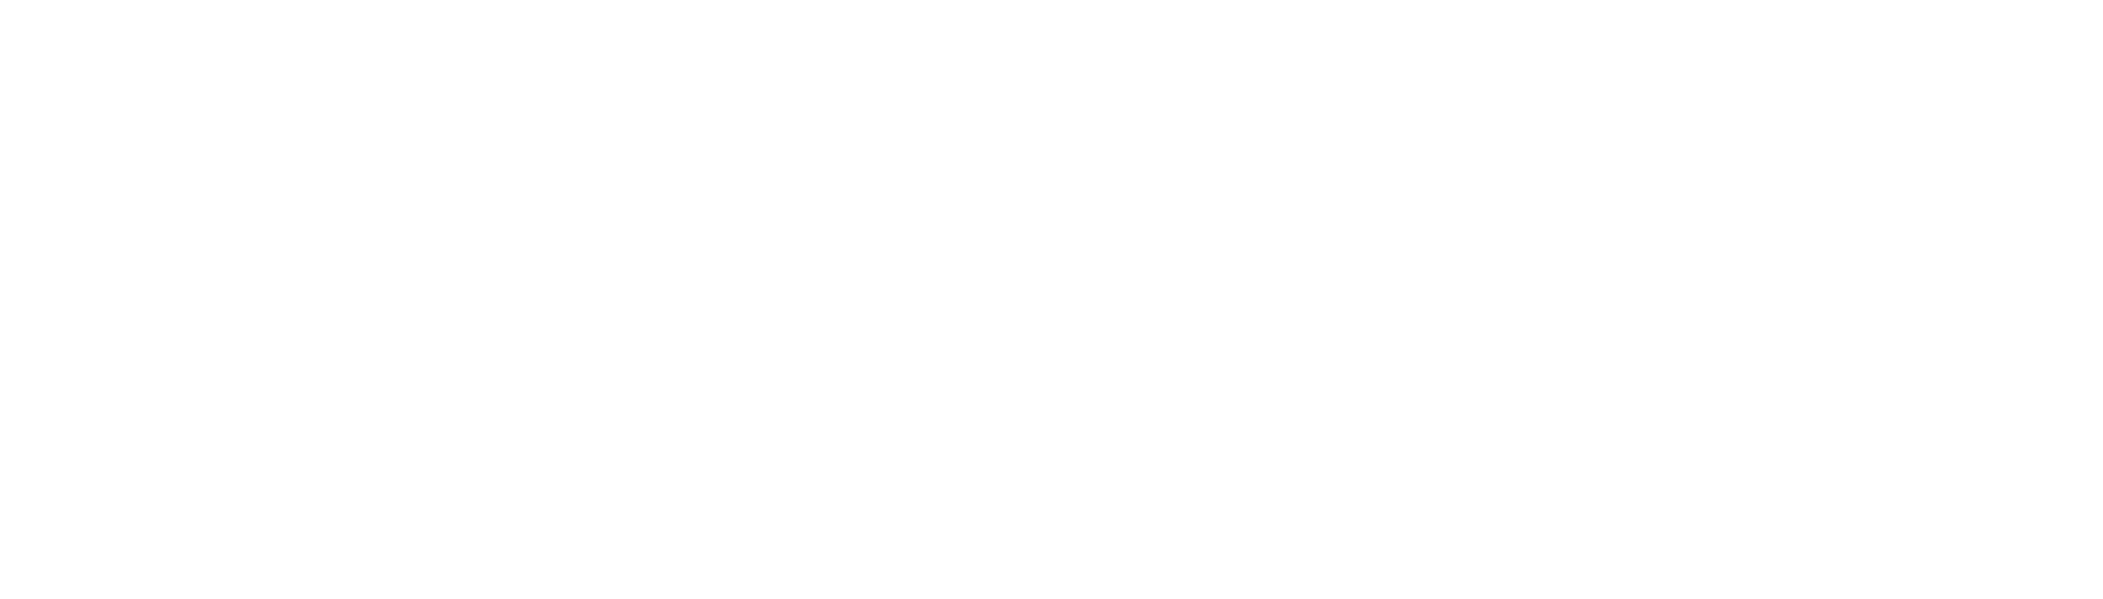 Top Talent Recruiter